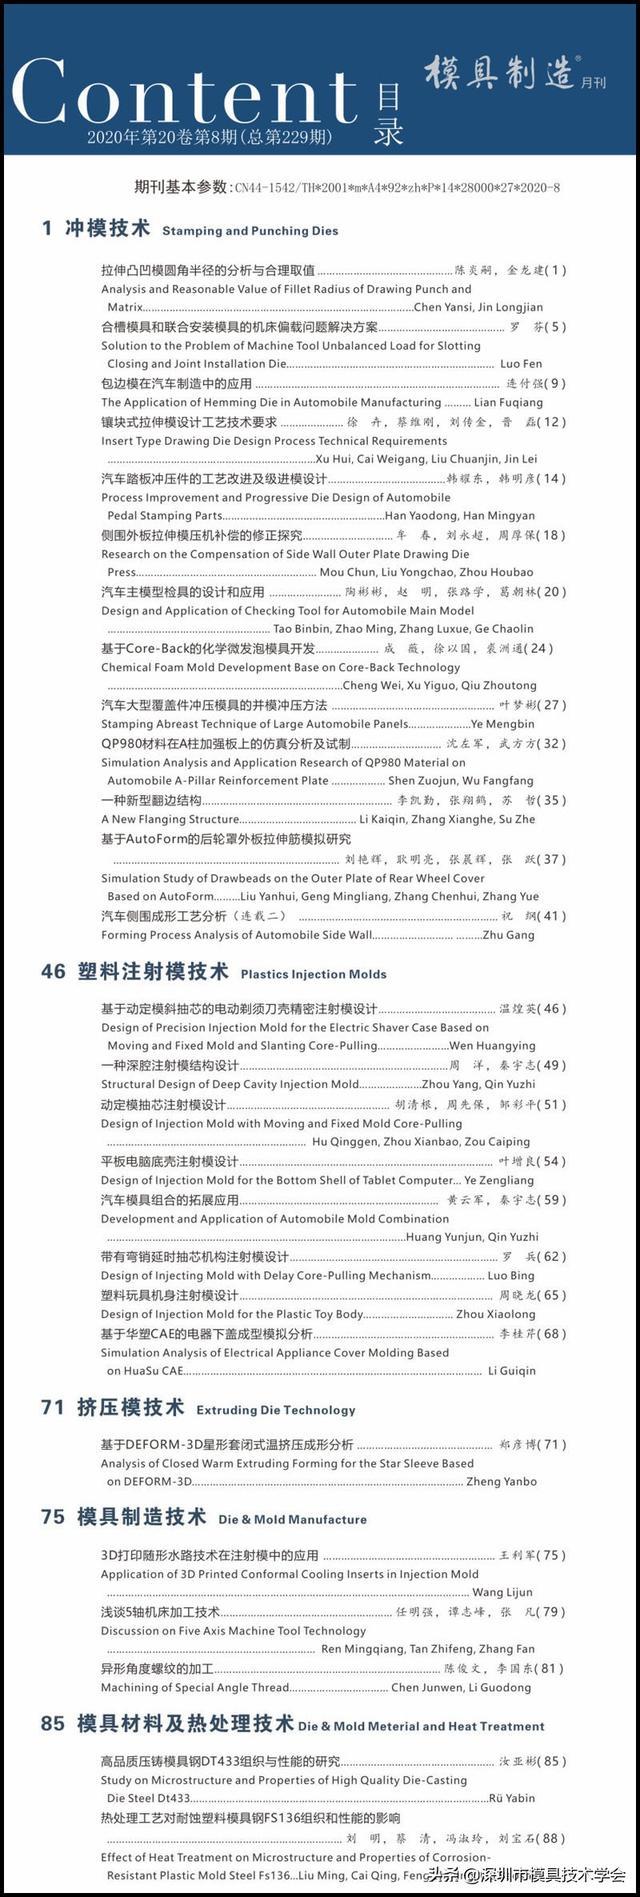 bob电竞官网2020年8月刊抢先看